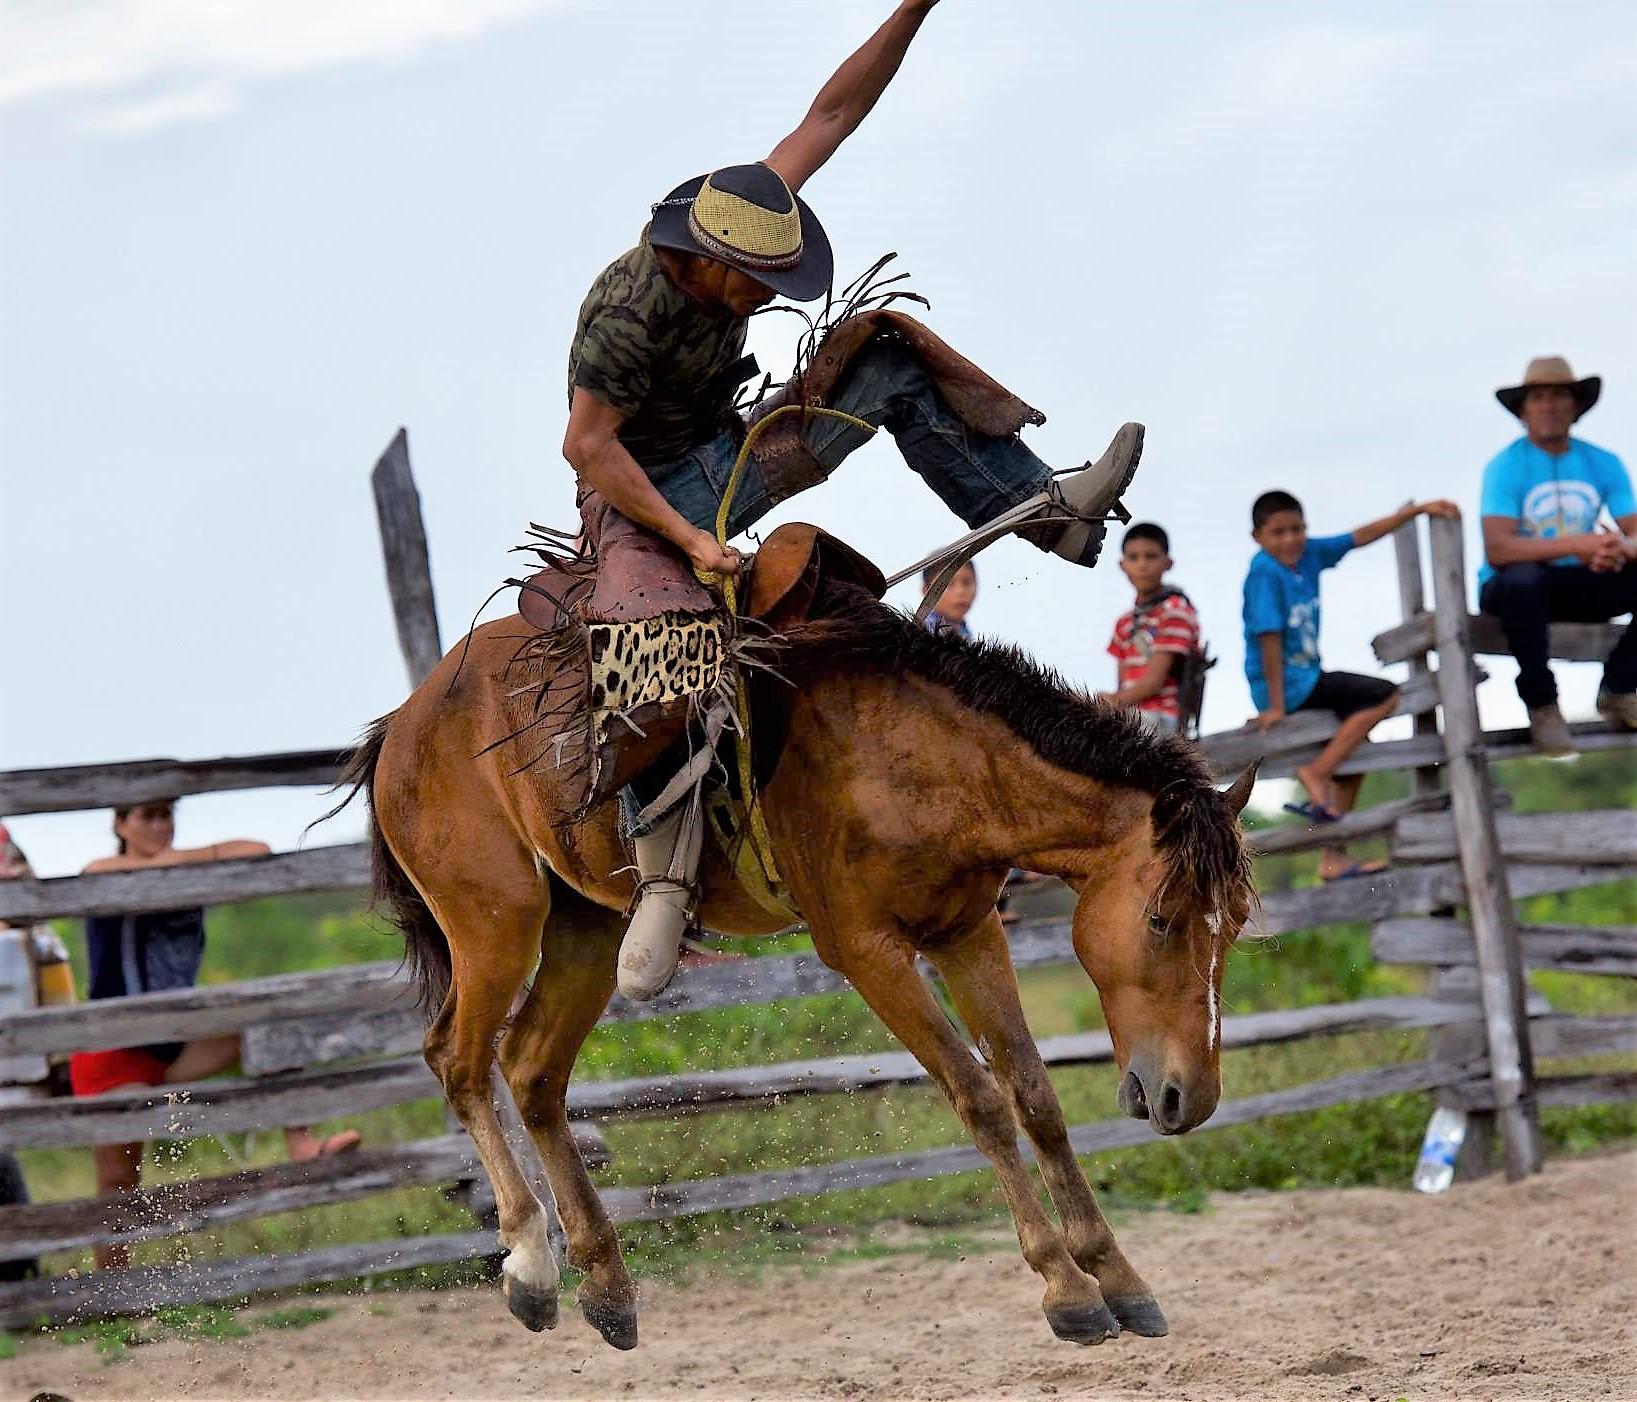 A celebratory mini rodeo